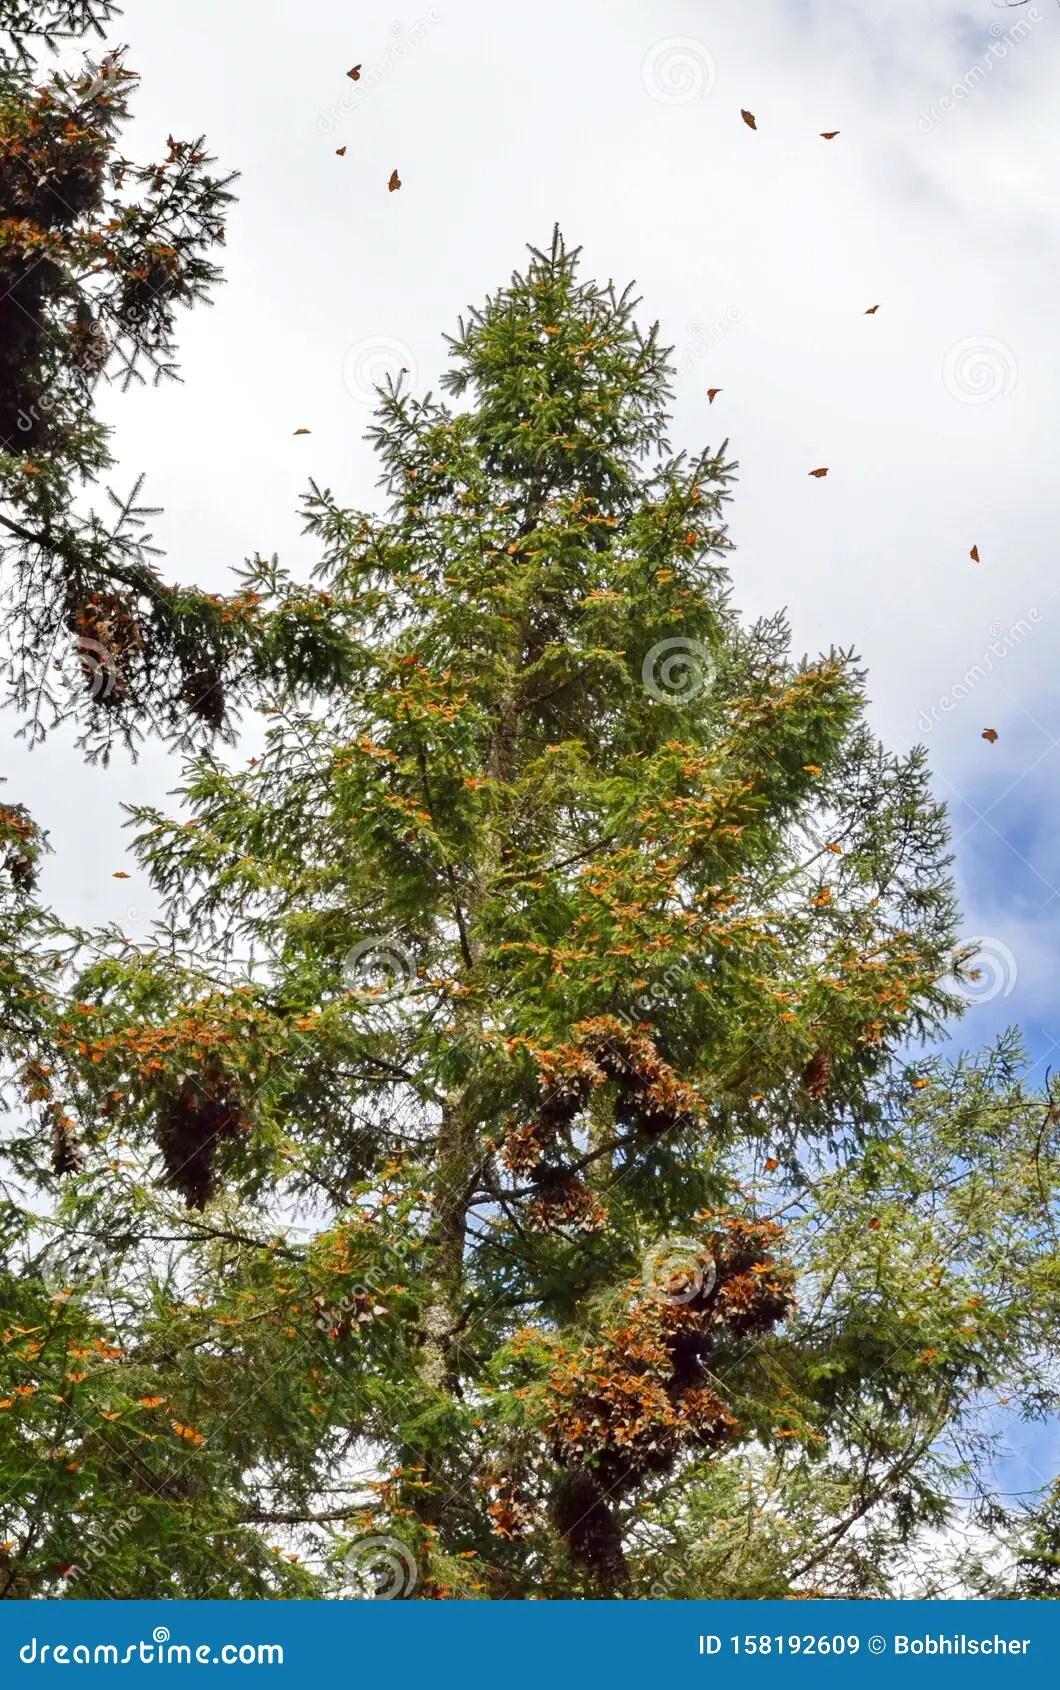 Cluster Of Monarch Butterflies On Tree Limbs At El Capulin